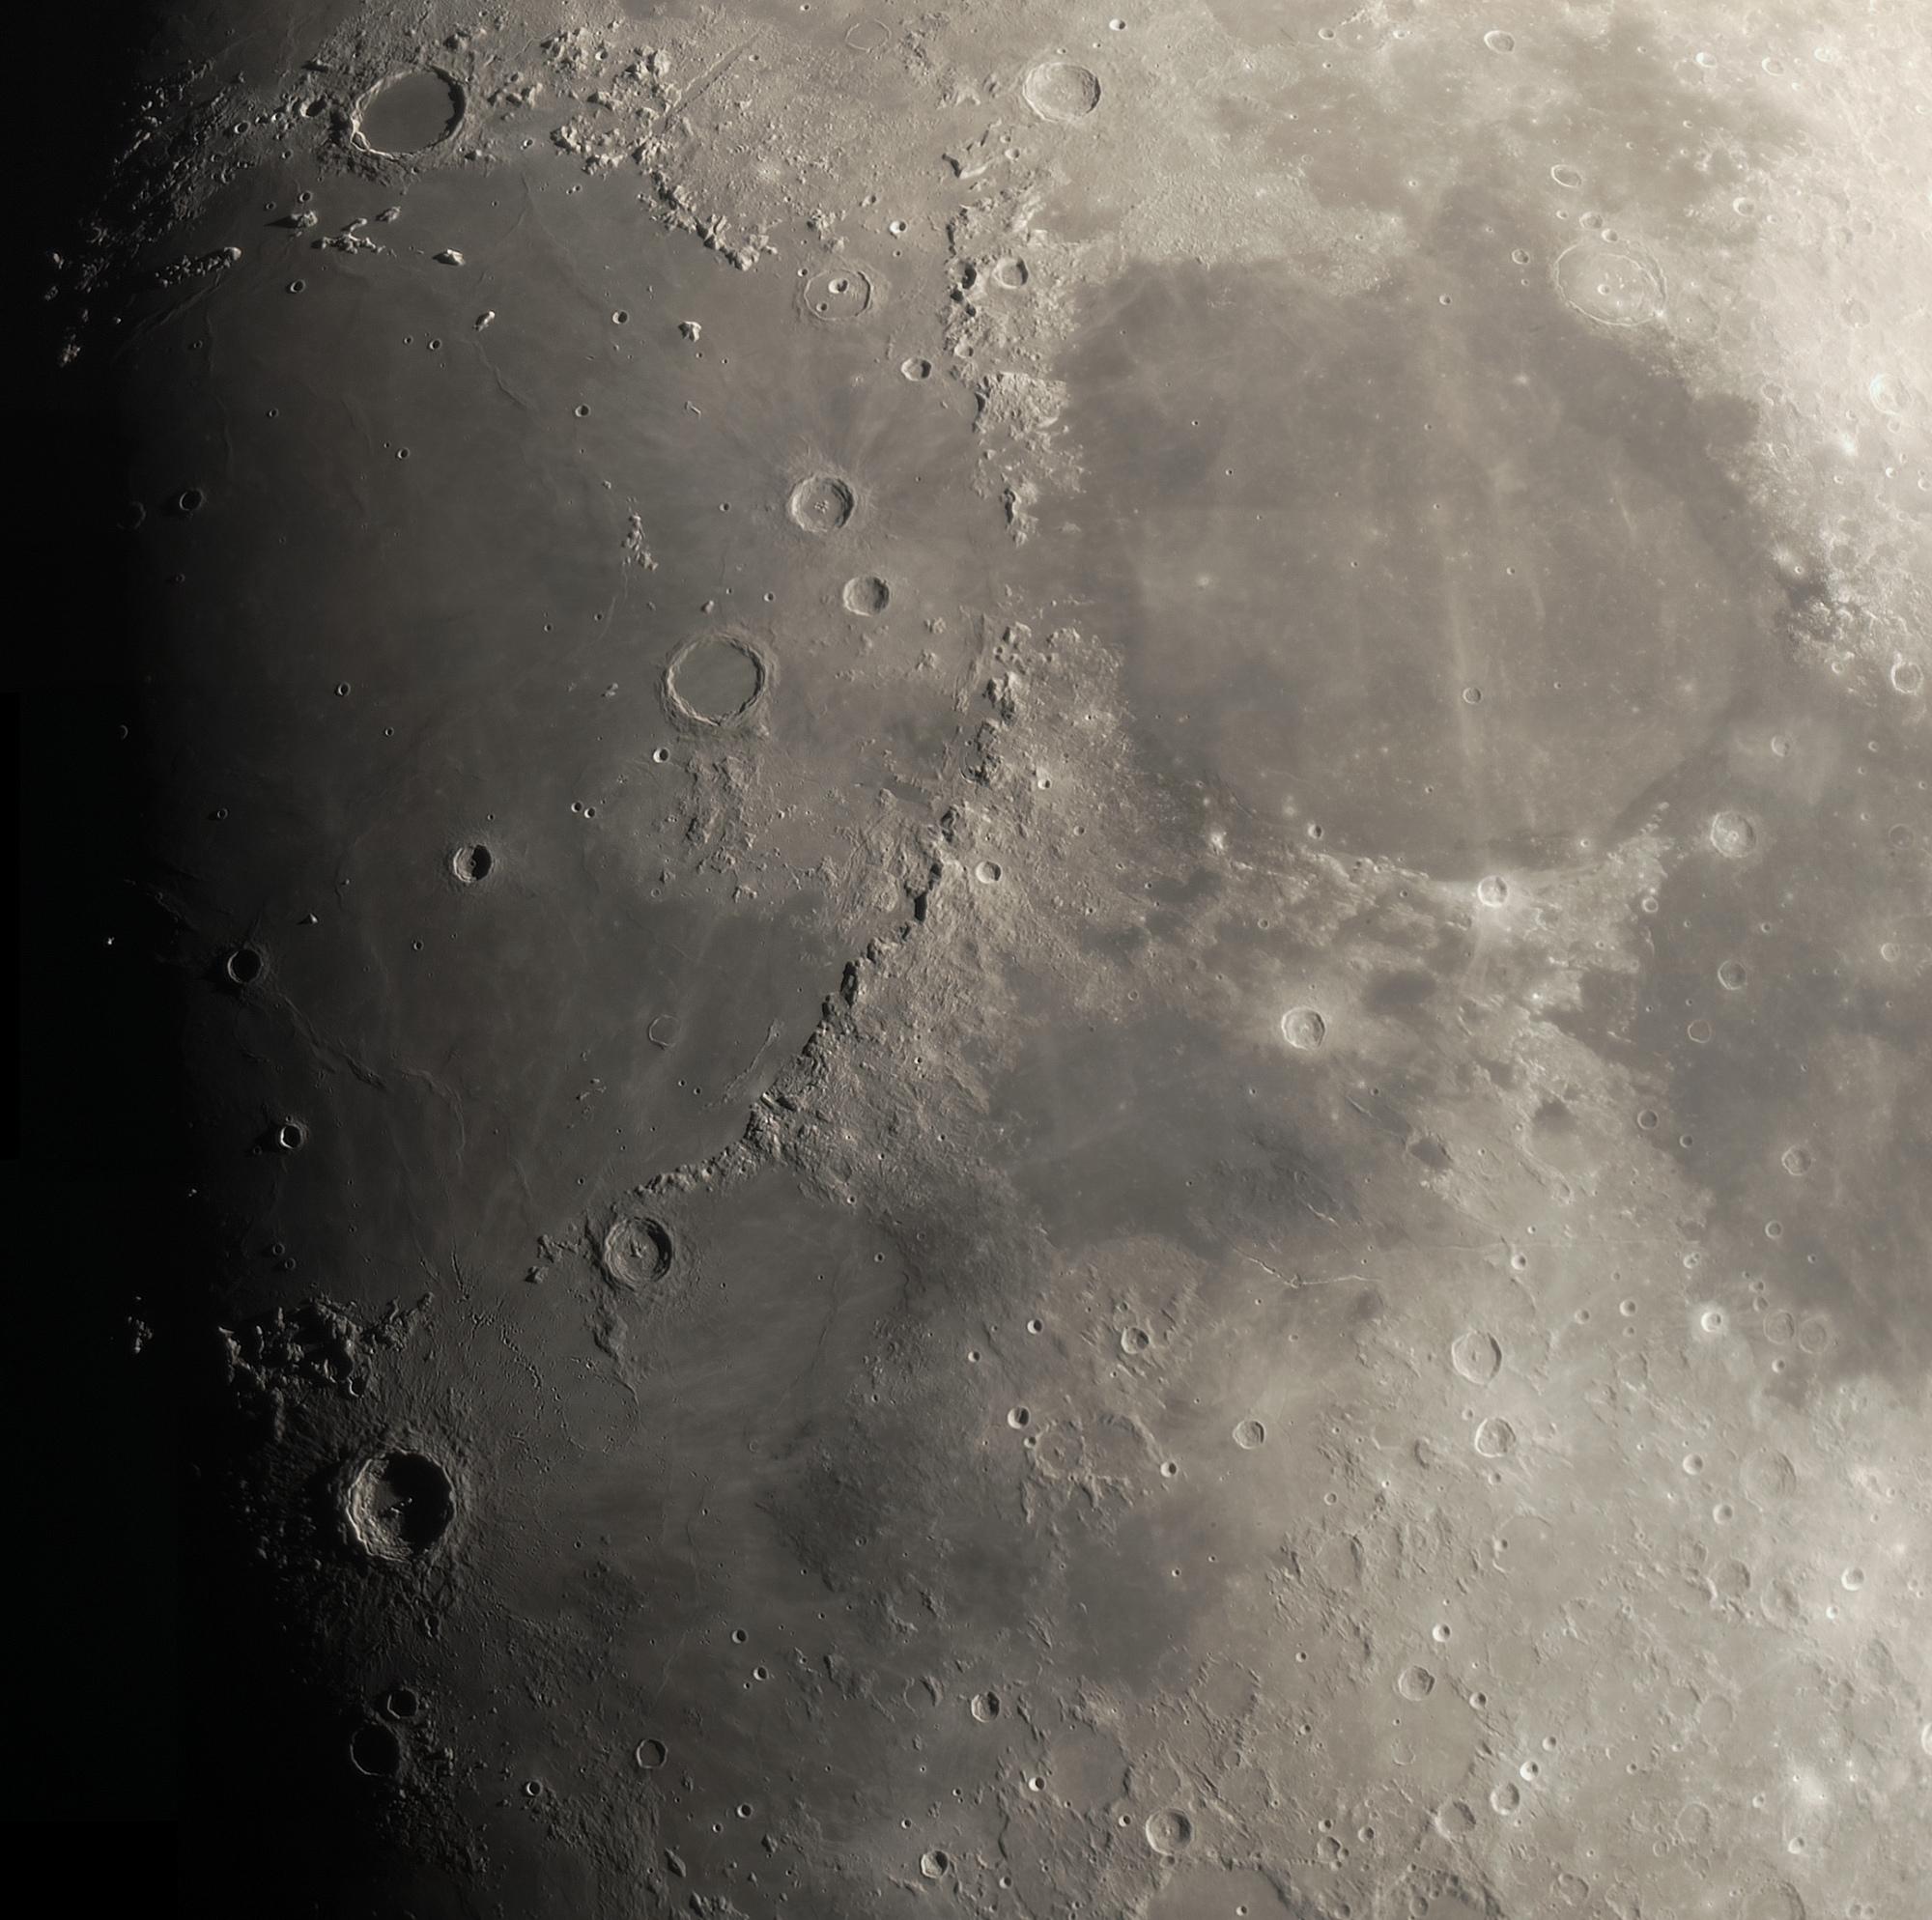 5ab94fe03482d_lune(70)a.thumb.jpg.45aa58134301a9c4d3115ae39282ed97.jpg